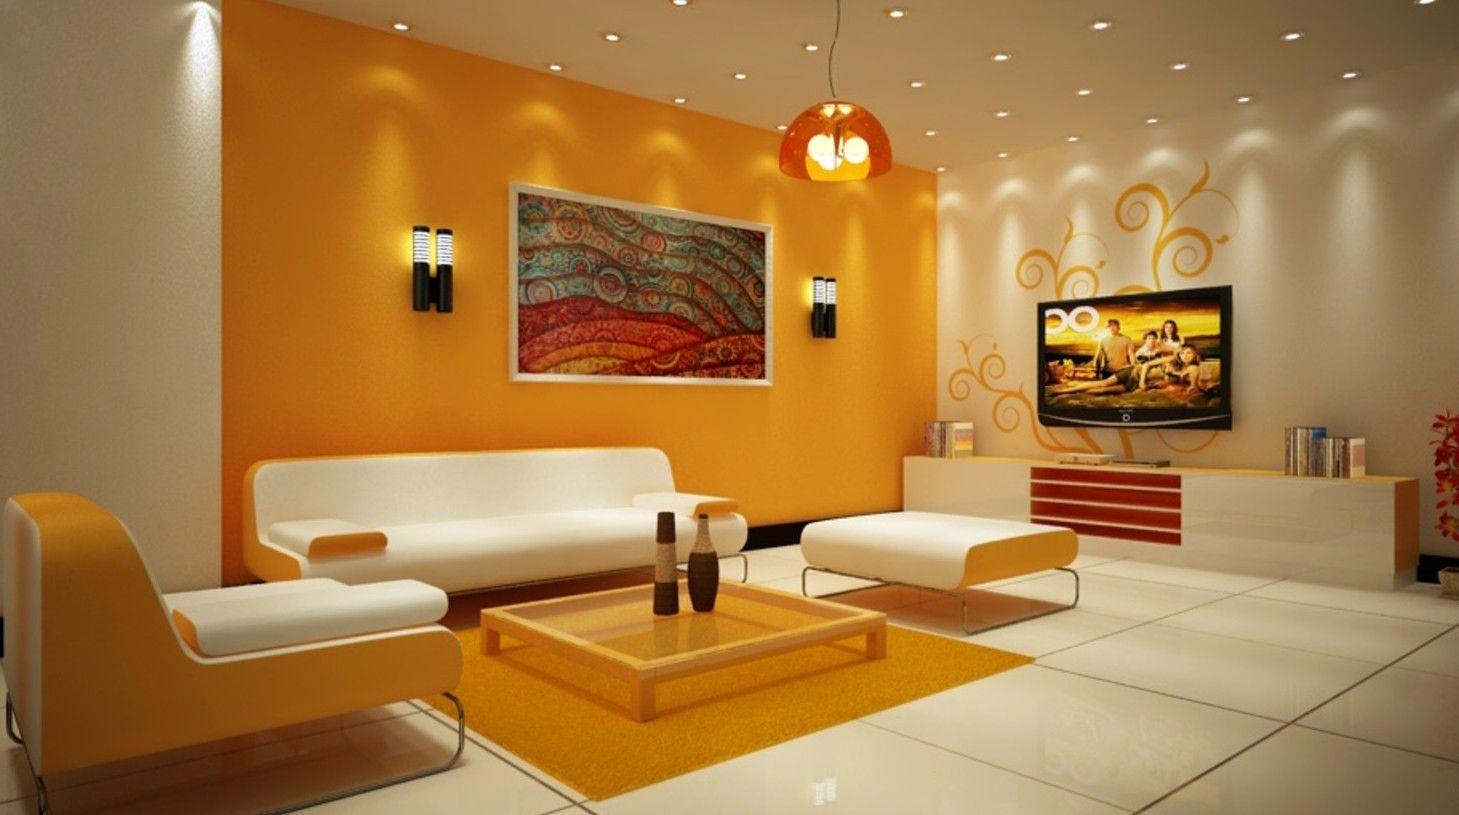 Modern Color Combination For Living Room Living Room Living Room Color Ideas Colour Shades For Living Room Interior Design Ideas Home Decorating Inspiration Living Room Color Yellow Living Room